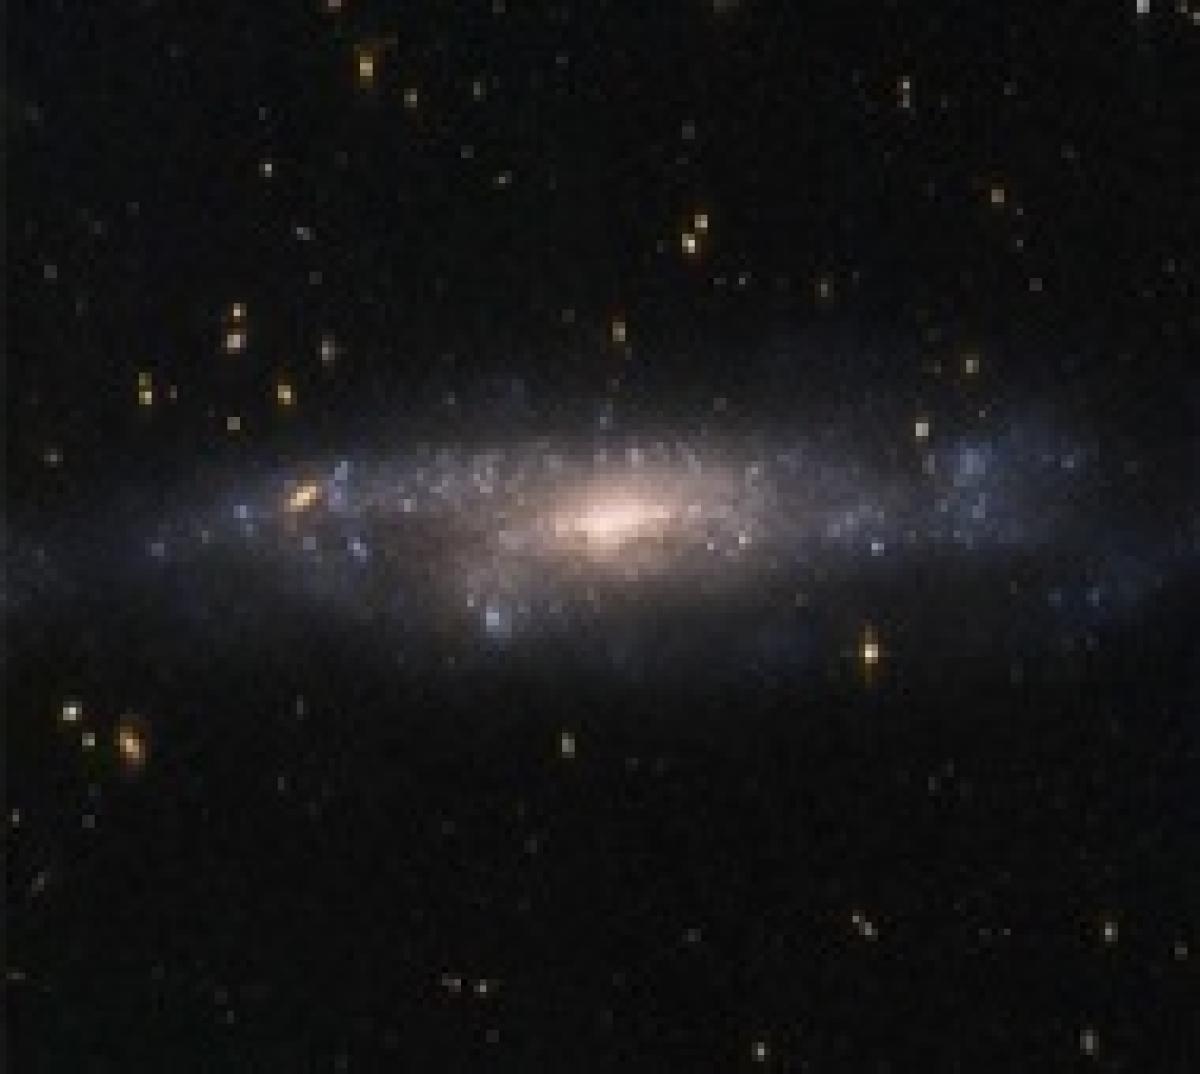 Hubble spots rare hidden galaxy in night sky